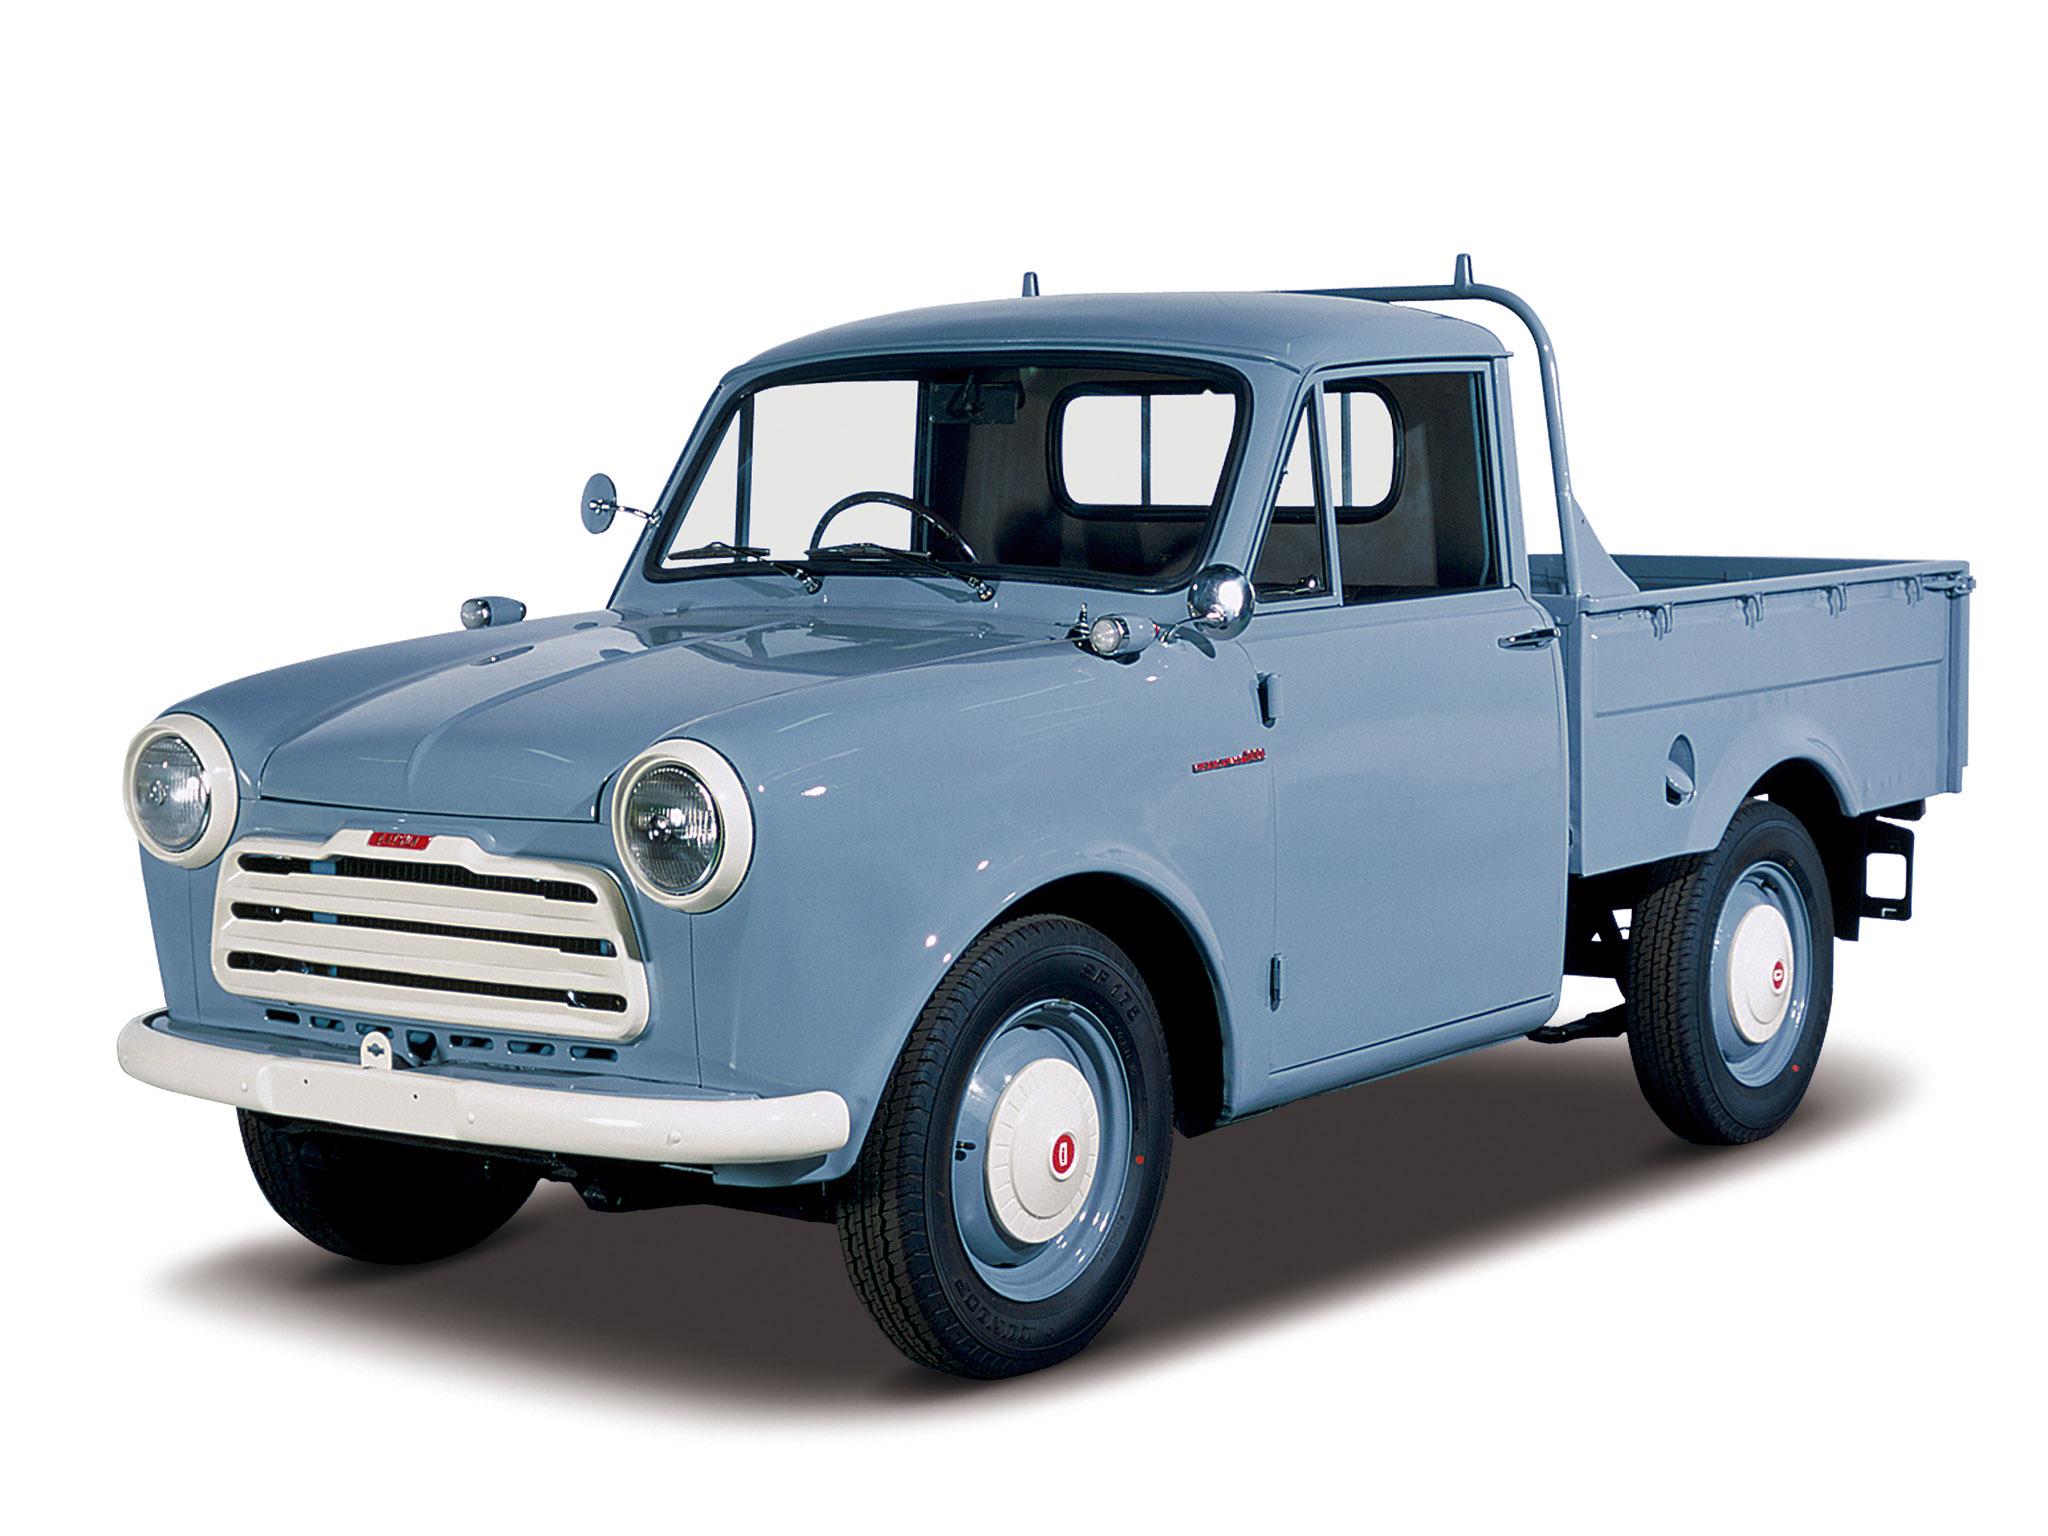 1957 datsun 1000 pickup 220 truck retro nissan wallpaper 2048x1536 105895 wallpaperup. Black Bedroom Furniture Sets. Home Design Ideas